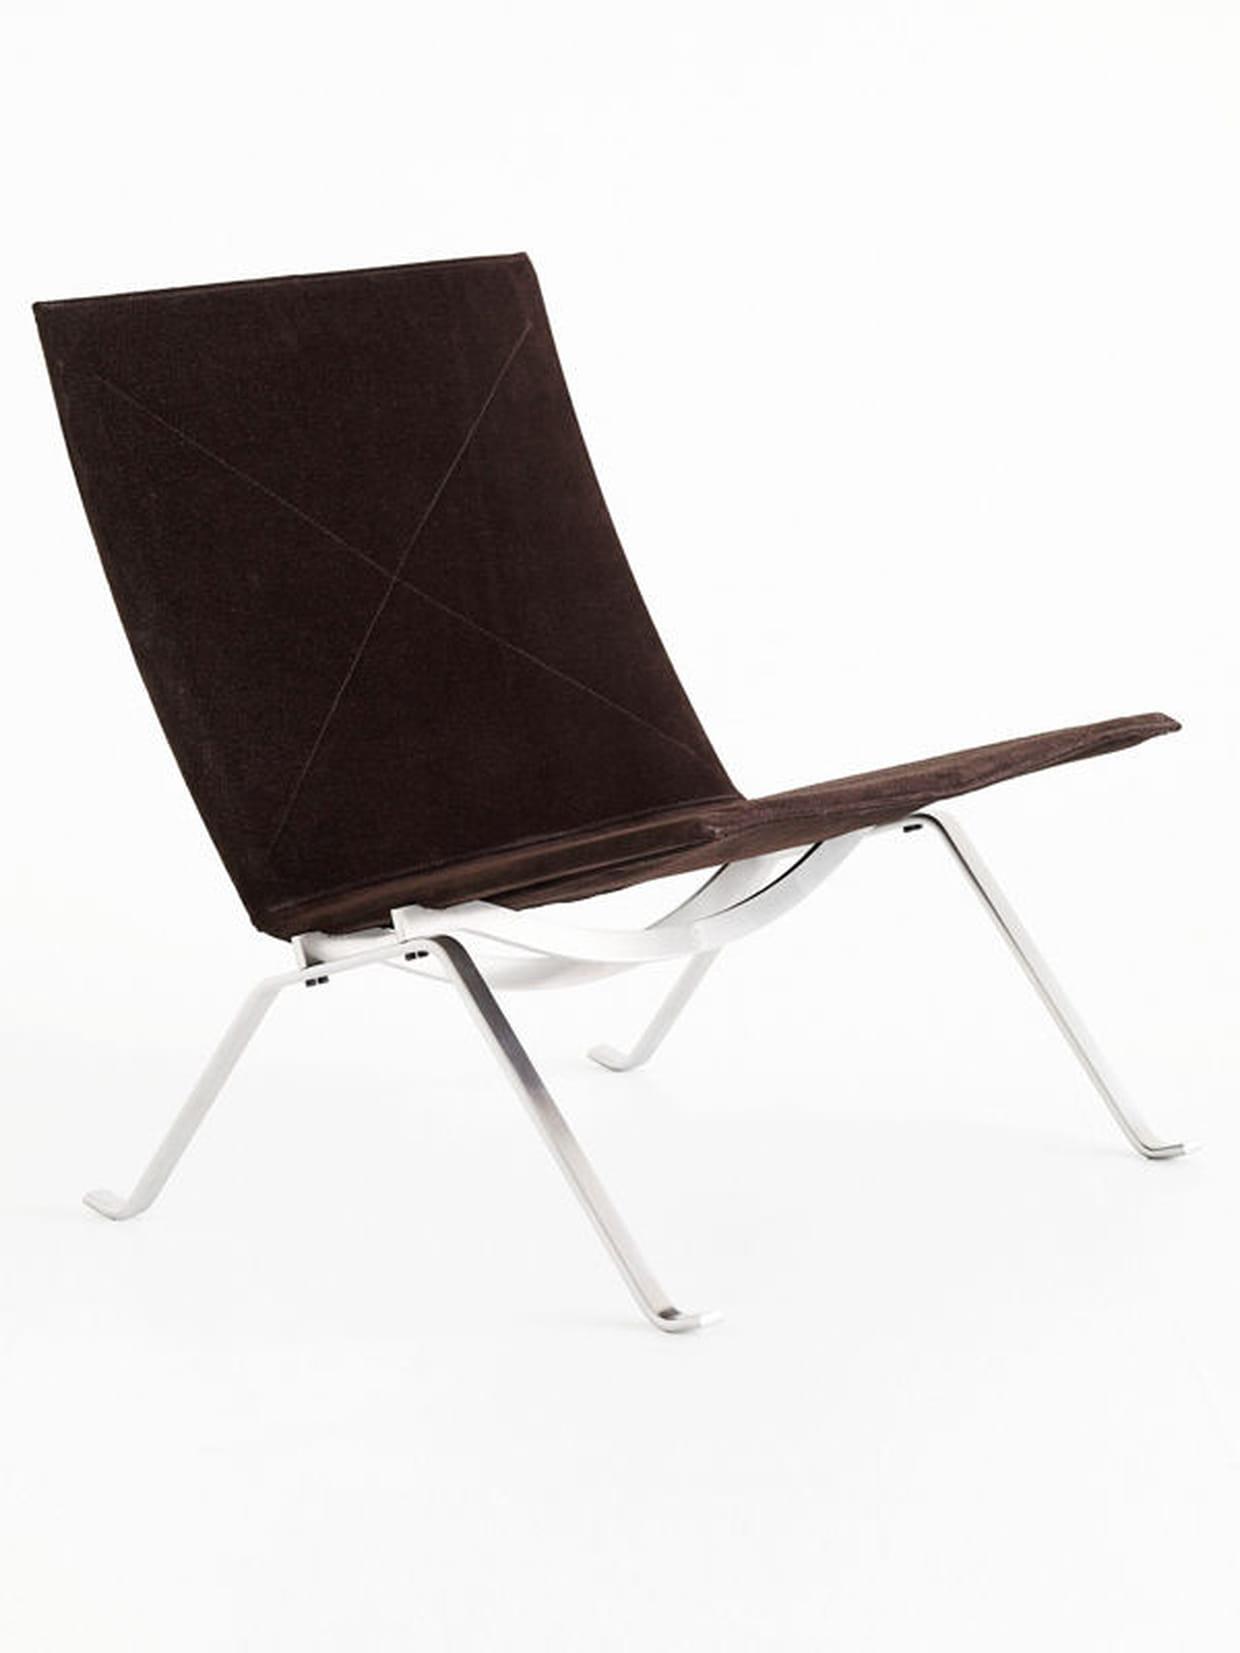 chauffeuse pk22 de fritz hansen. Black Bedroom Furniture Sets. Home Design Ideas